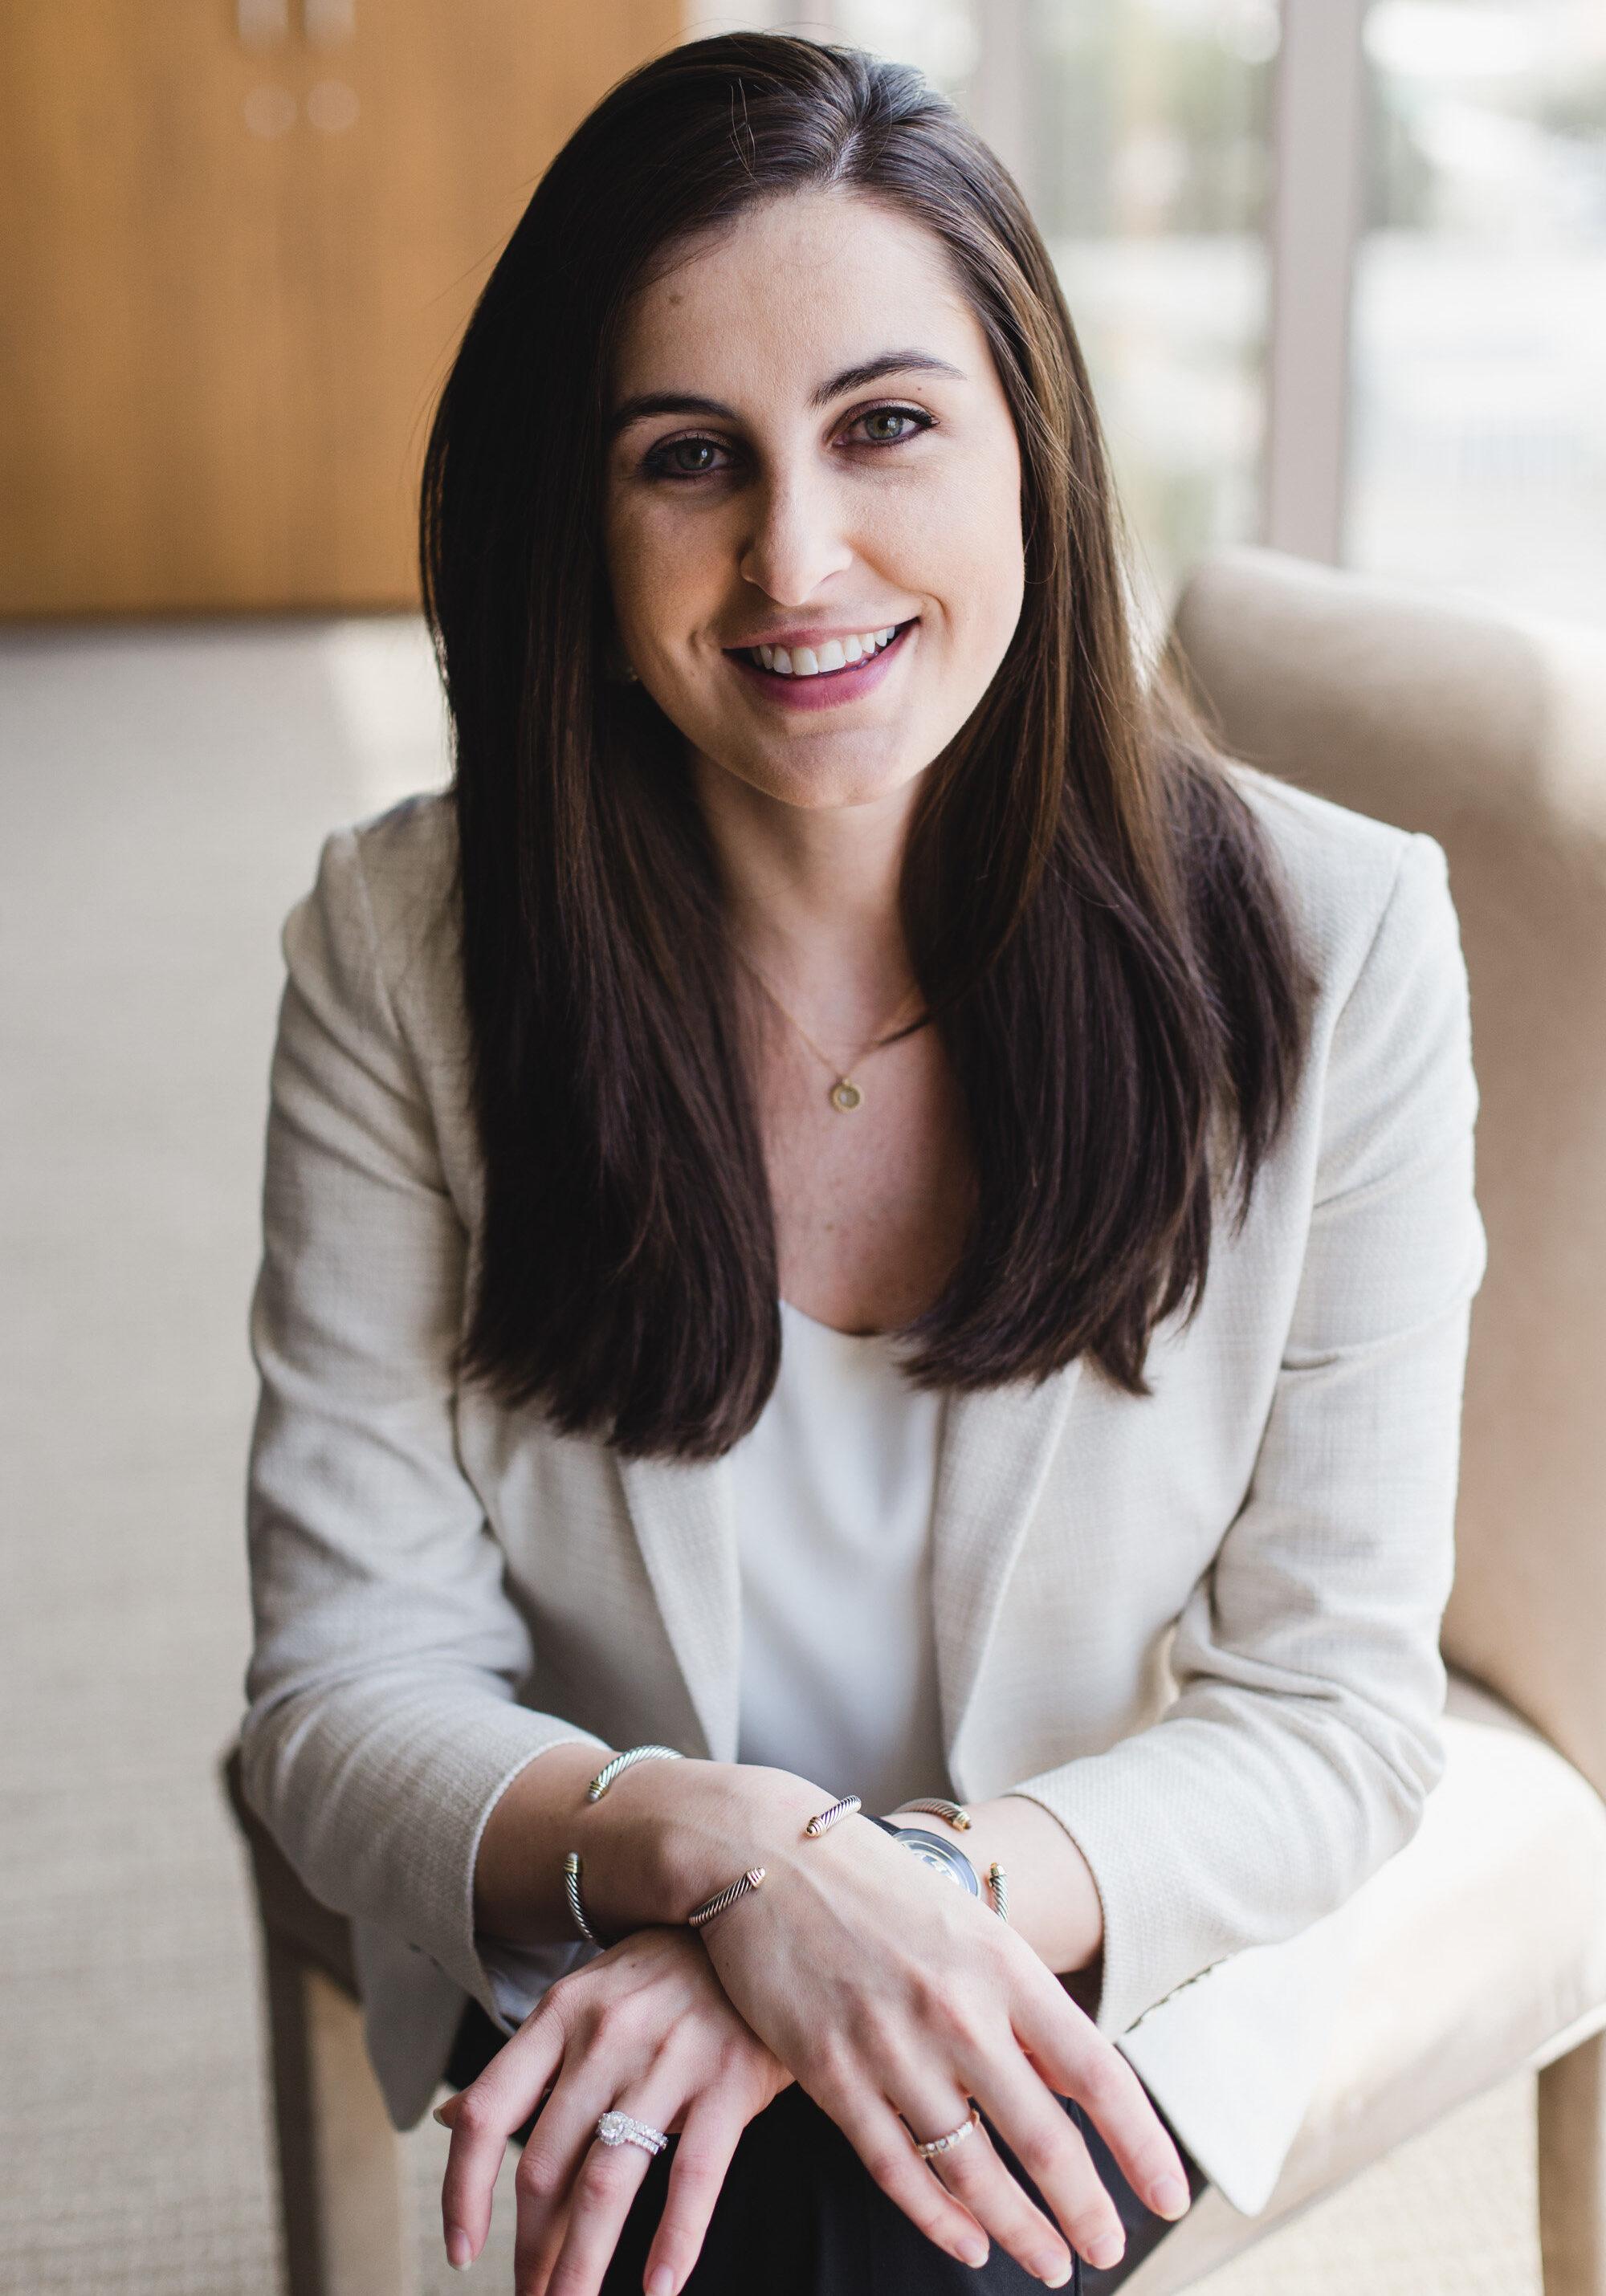 Natalie Coldiron